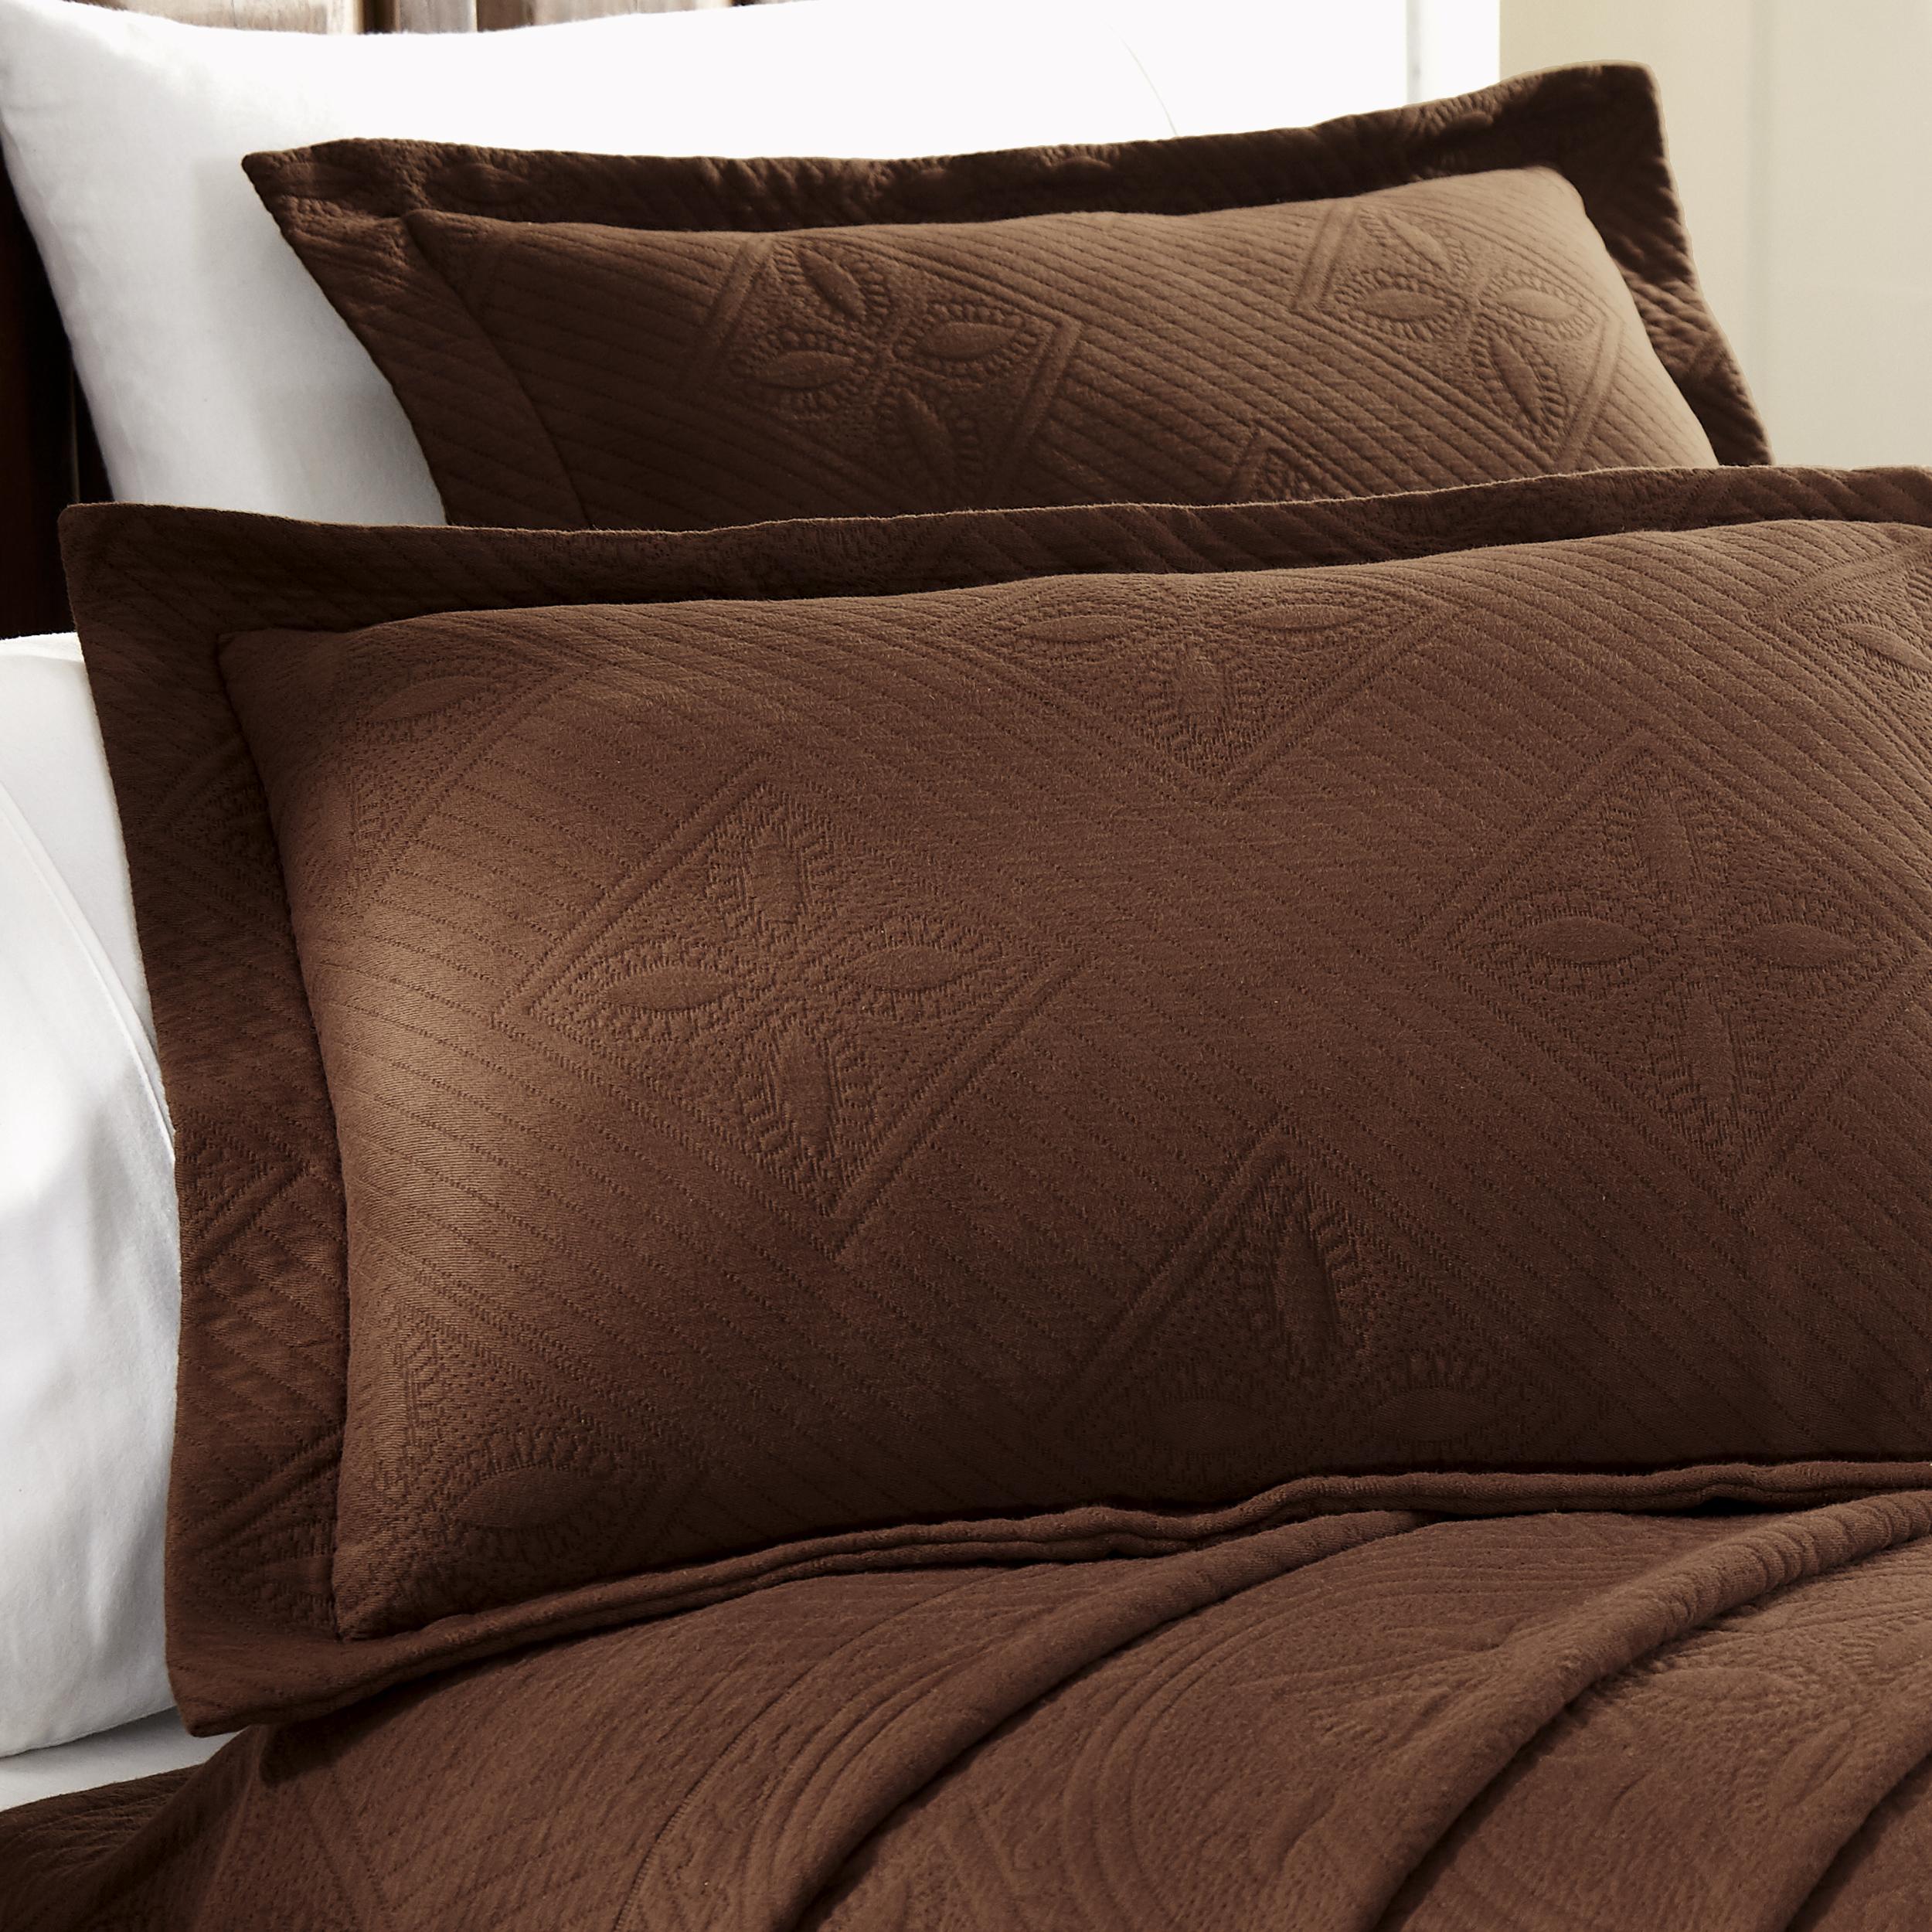 Celtic-Circle-Cotton-Jacquard-Matelasse-Scalloped-Bedspread-Set thumbnail 12